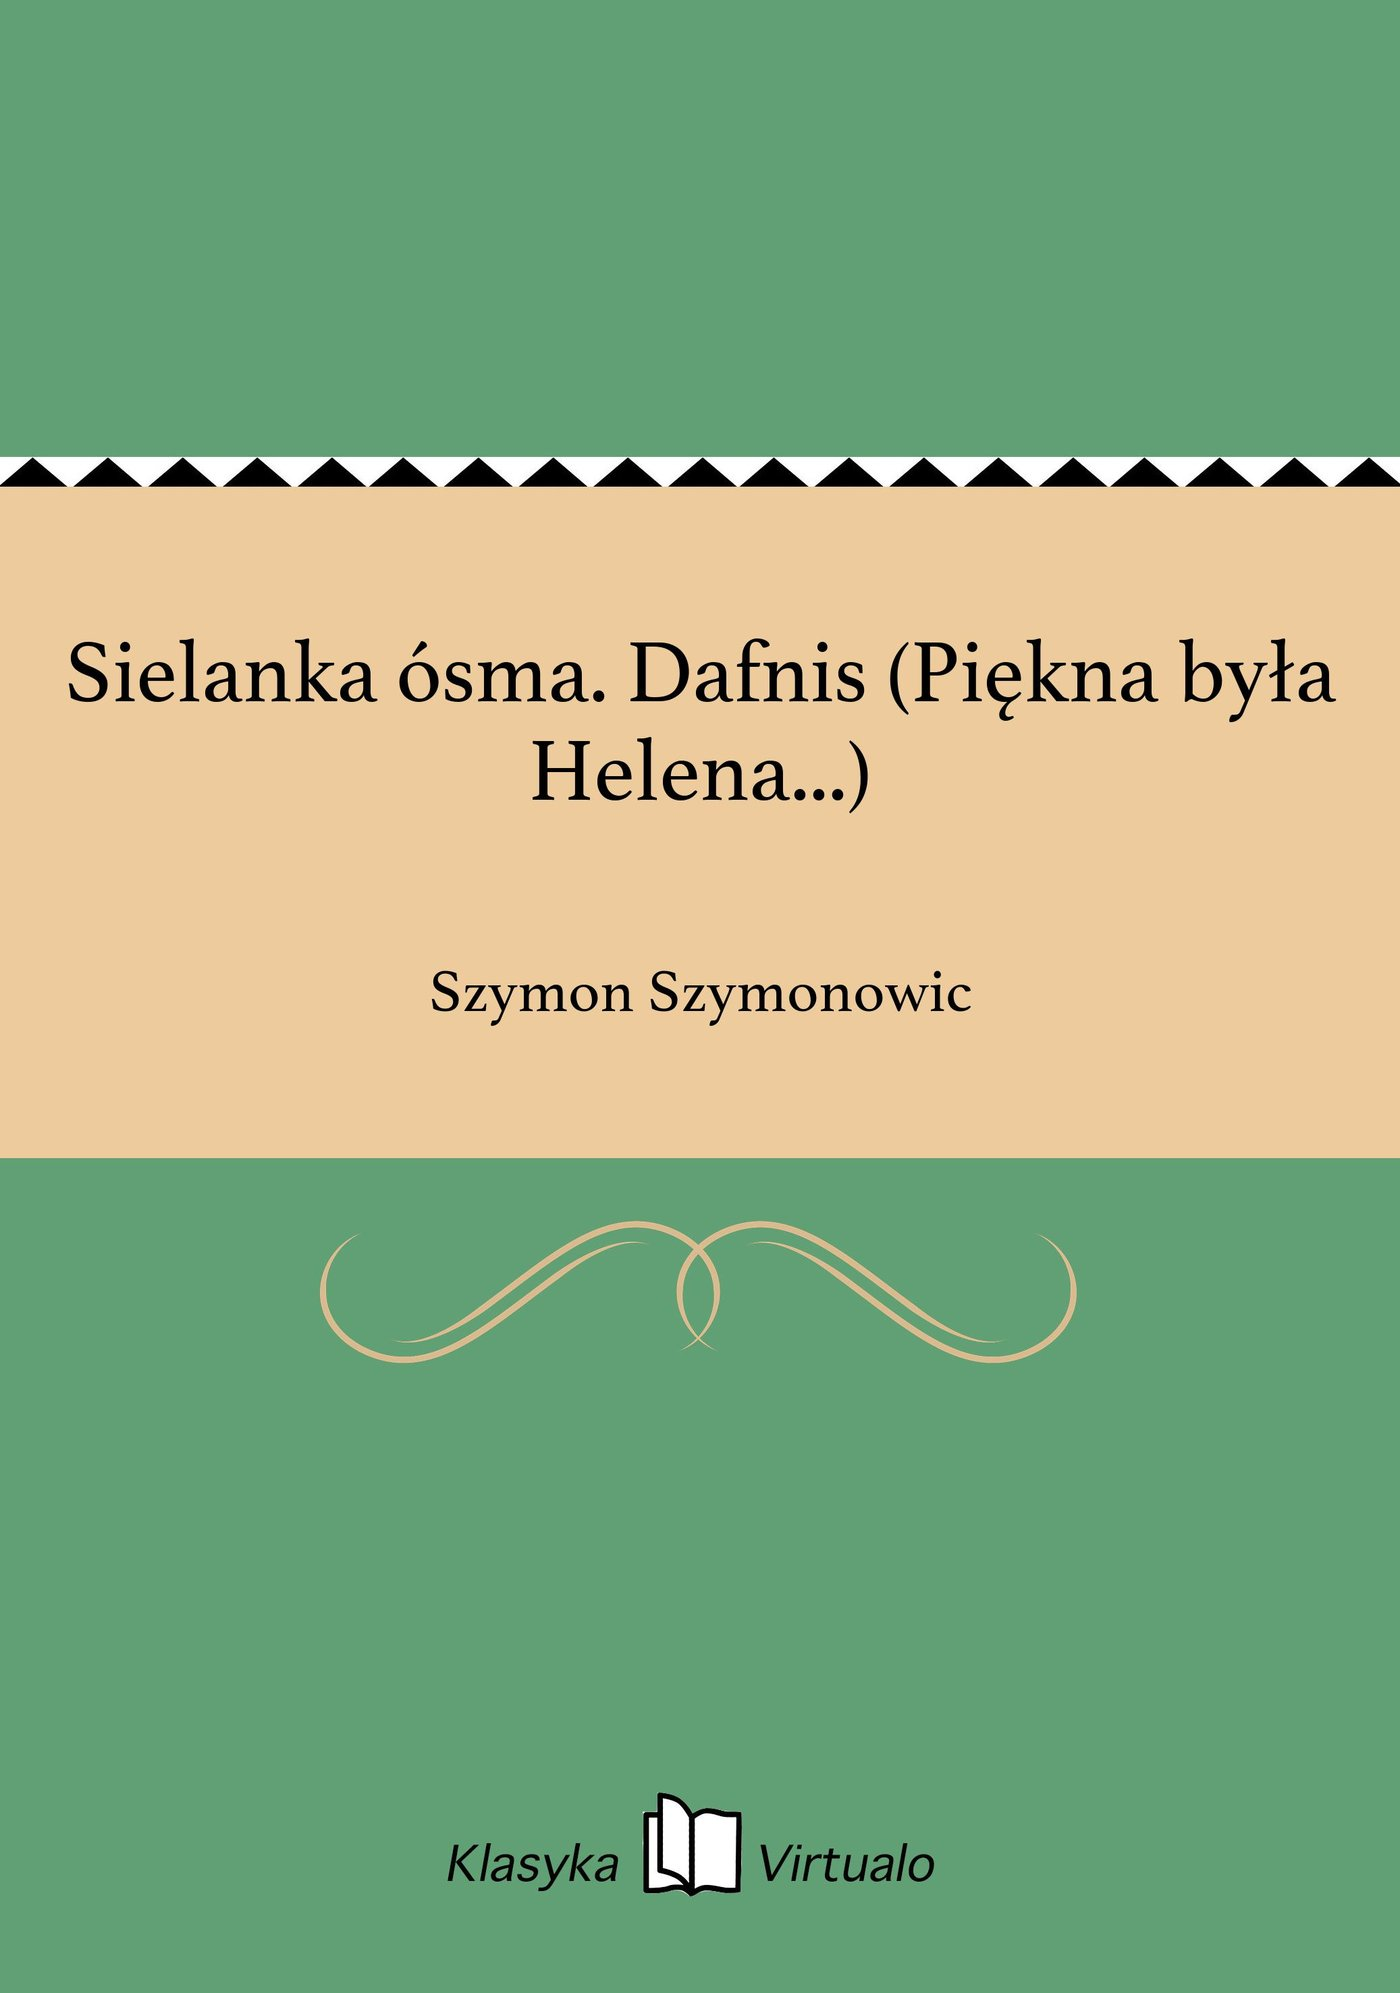 Sielanka ósma. Dafnis (Piękna była Helena...) - Ebook (Książka na Kindle) do pobrania w formacie MOBI